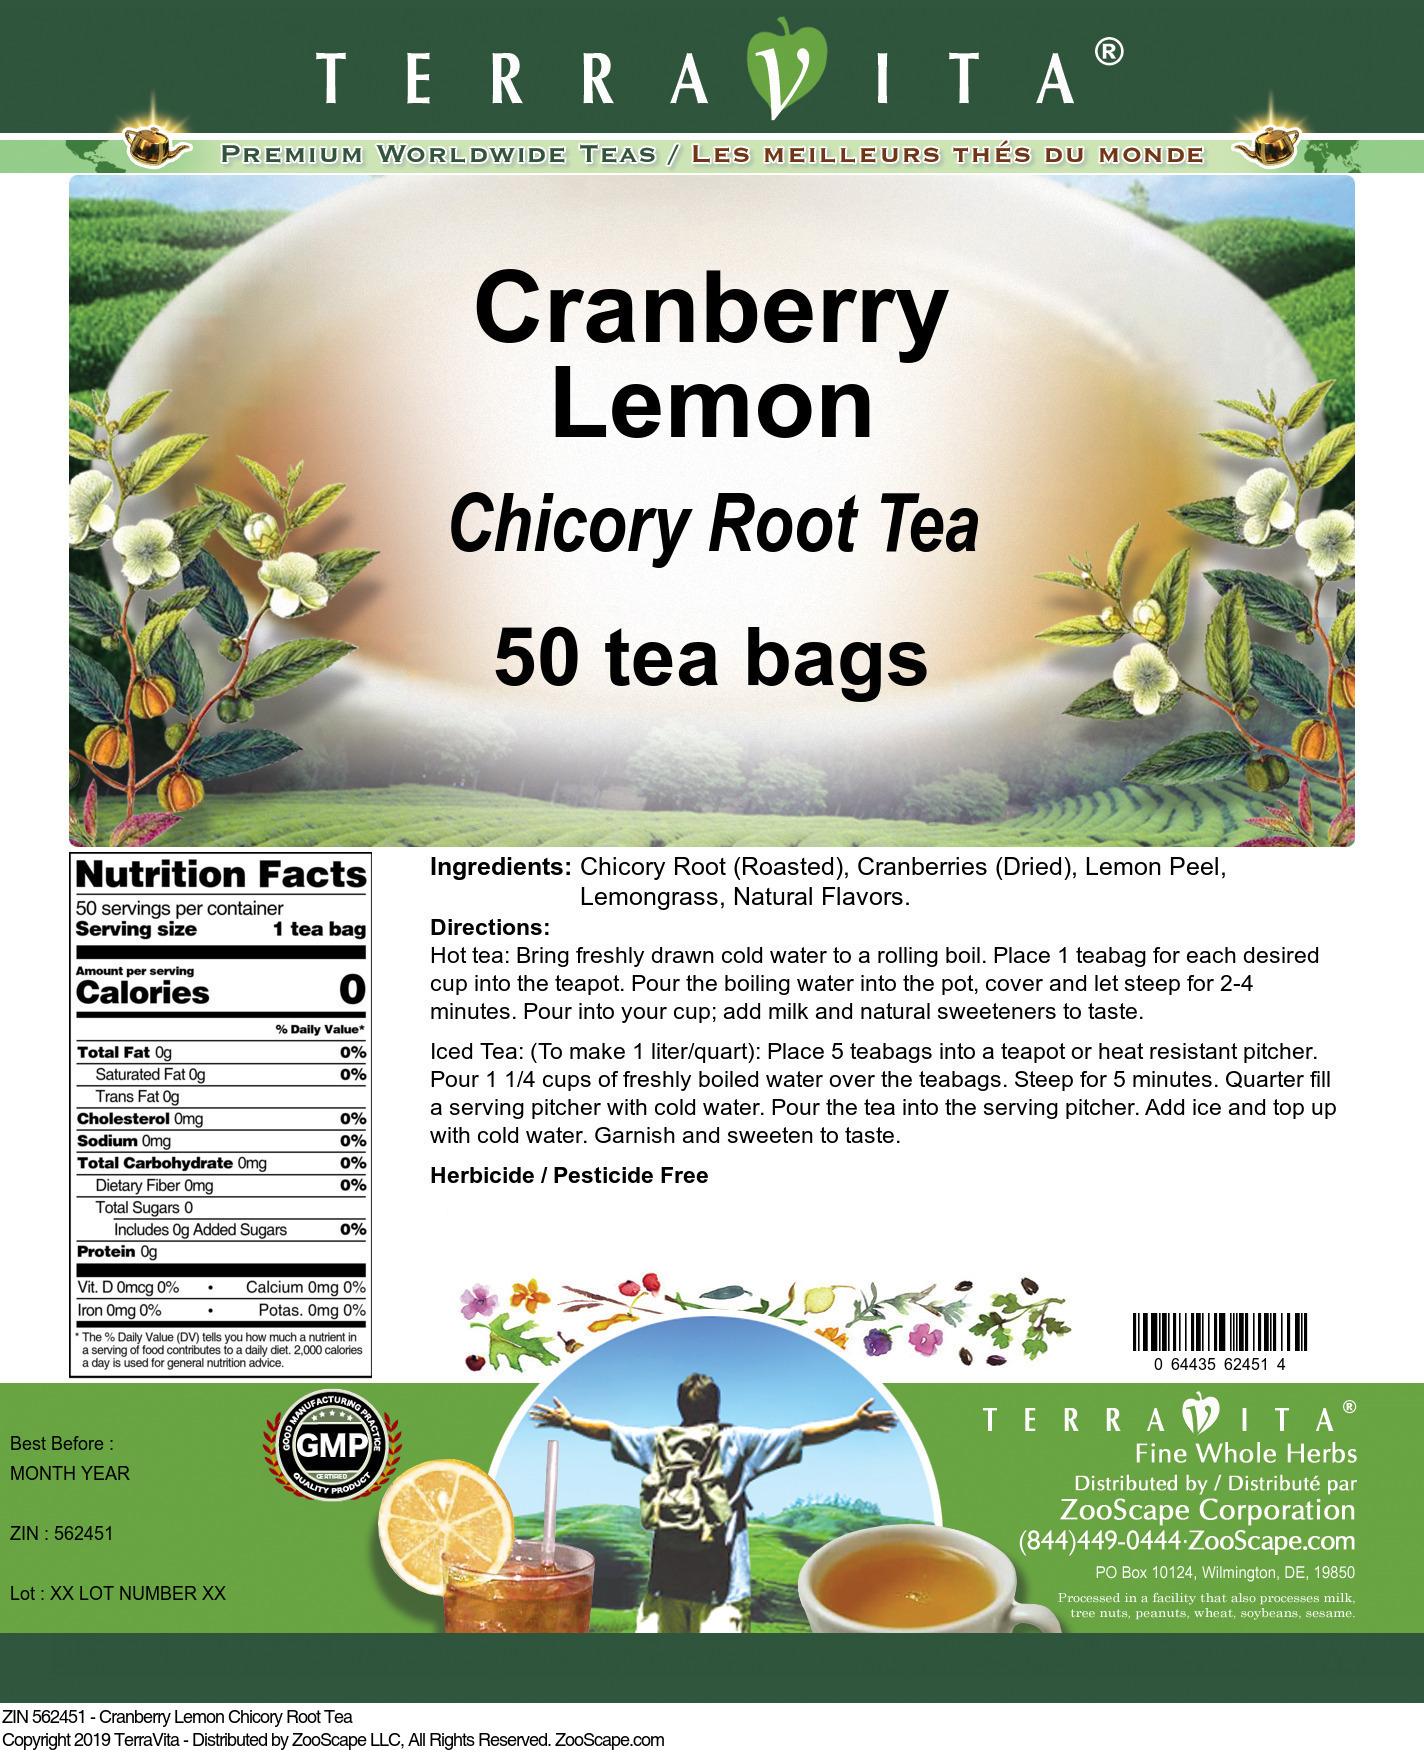 Cranberry Lemon Chicory Root